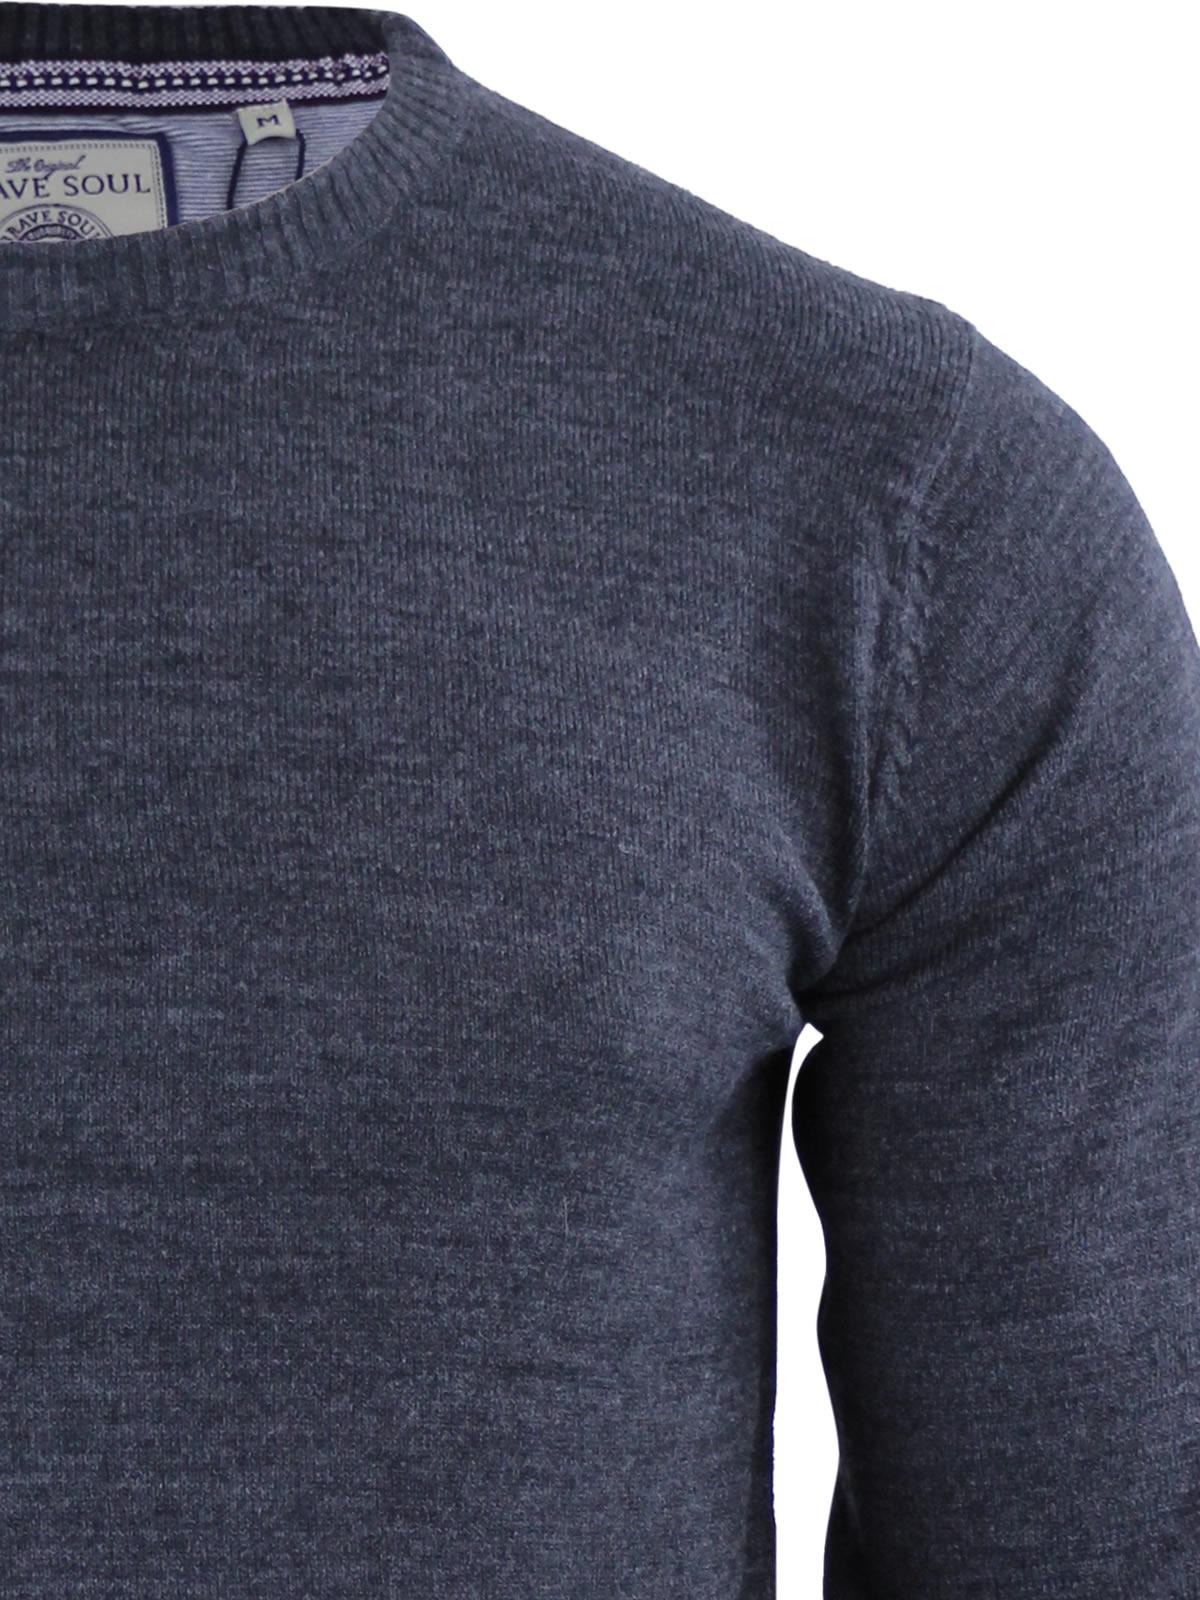 Mens-Jumper-Brave-Soul-Urbain-Knitted-Crew-Neck-Sweater thumbnail 10